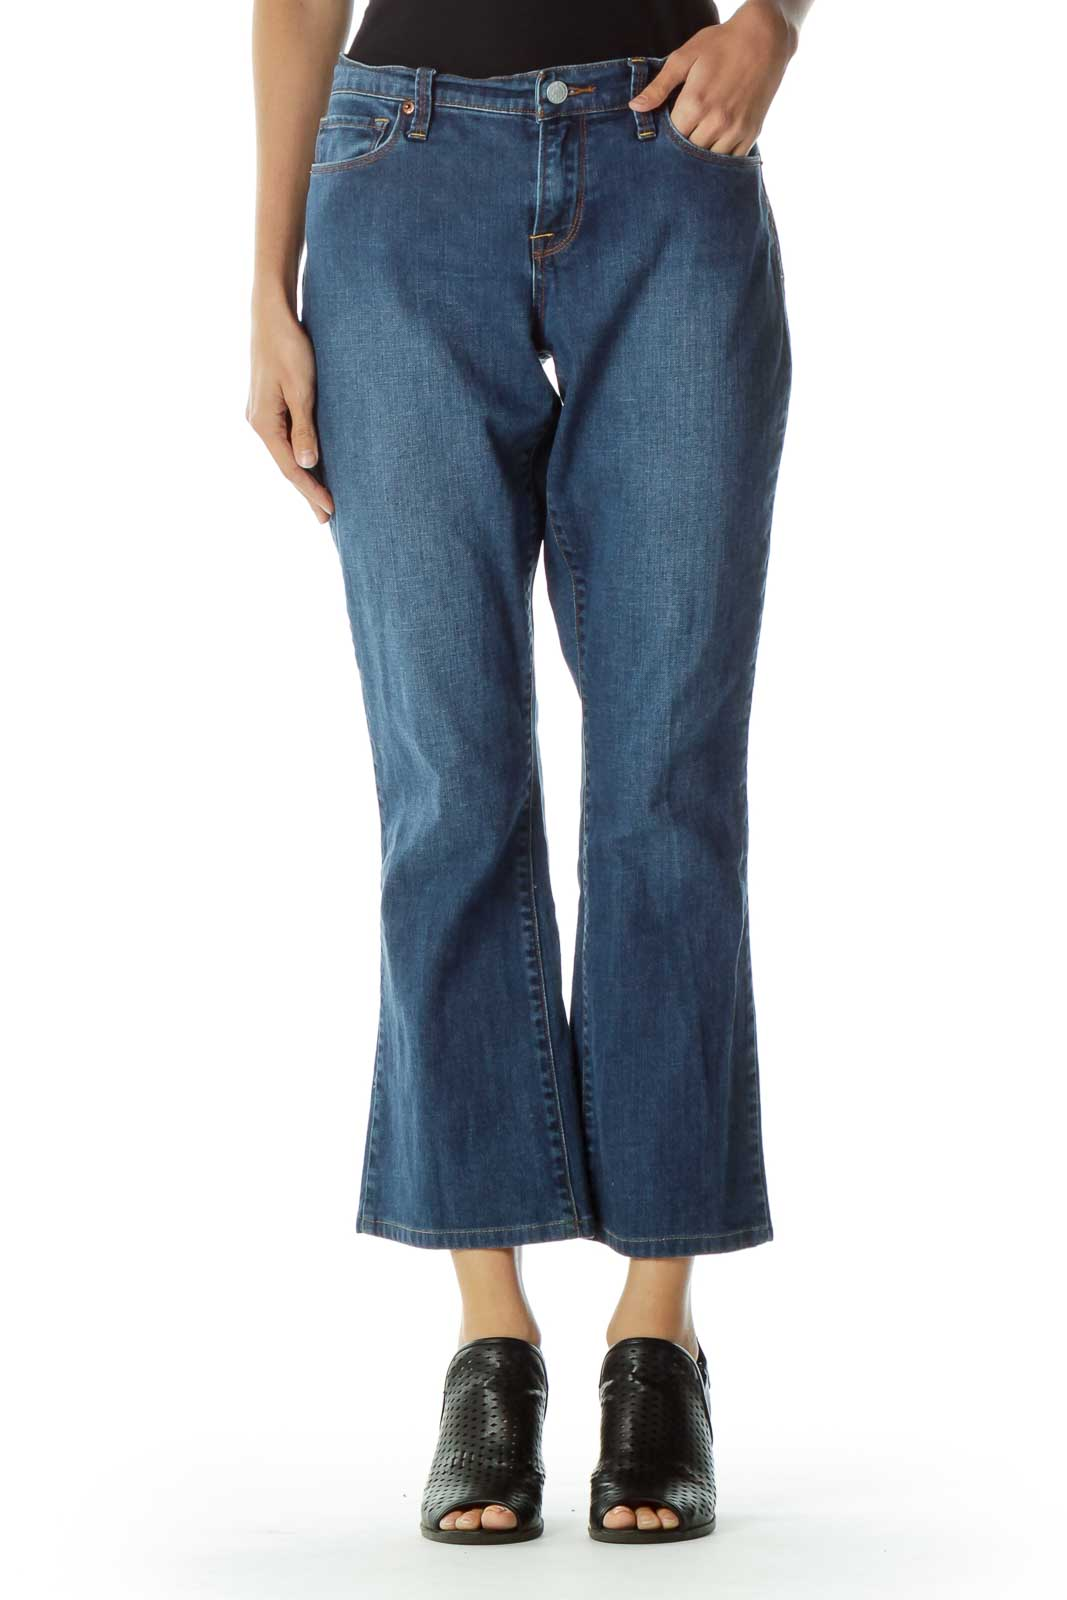 Blue 7/8 Boot Cut Jeans